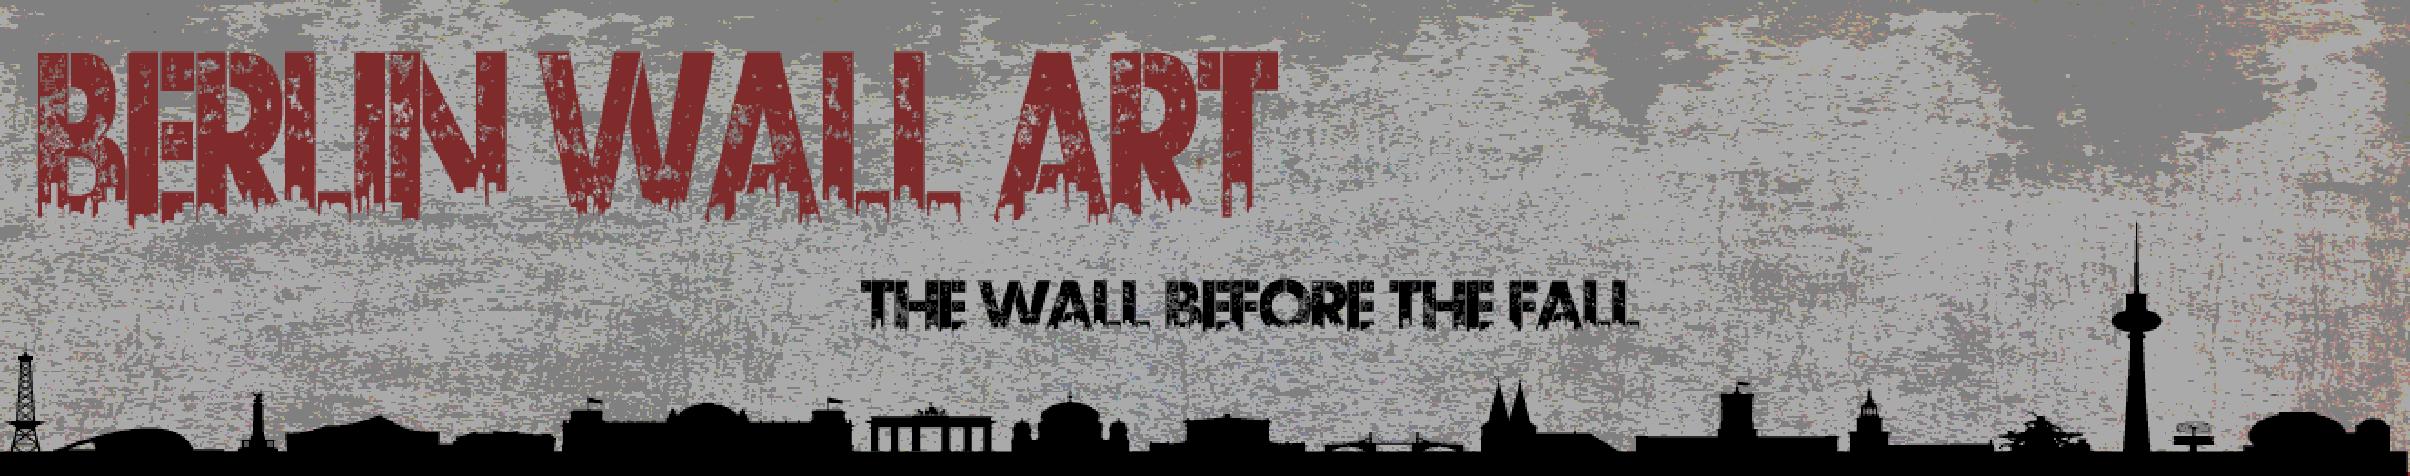 Berlin Wall Art berlin wall art | home